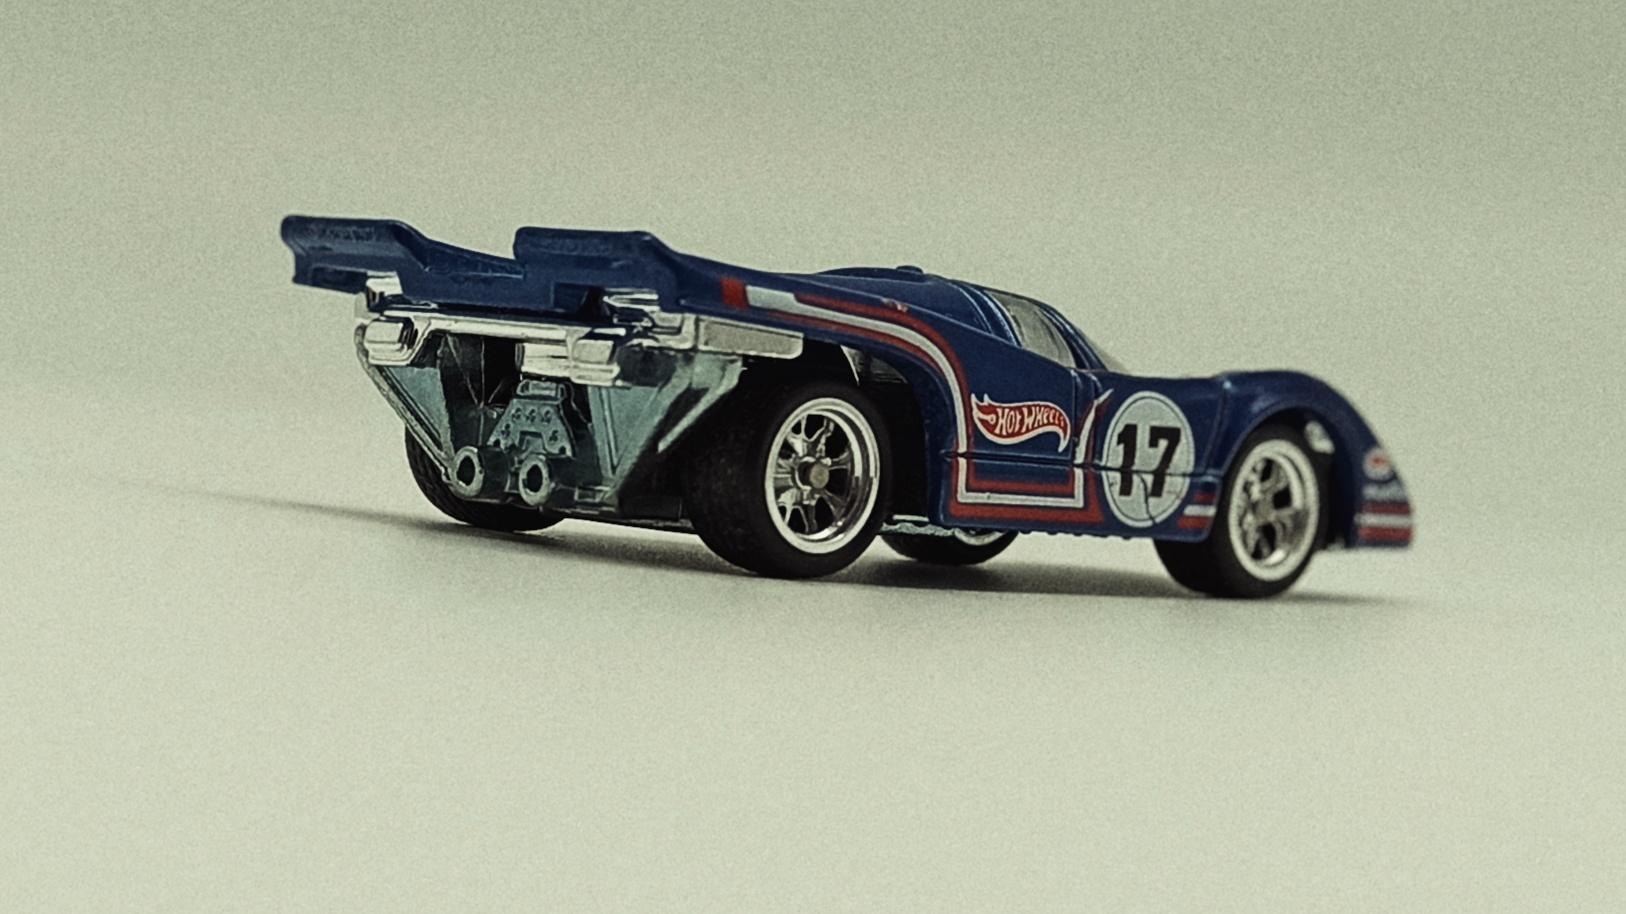 Hot Wheels Porsche 917K (Re-Tooled Version) (CFN62) 2015 Heritage (18/18) metalflake blue side angle